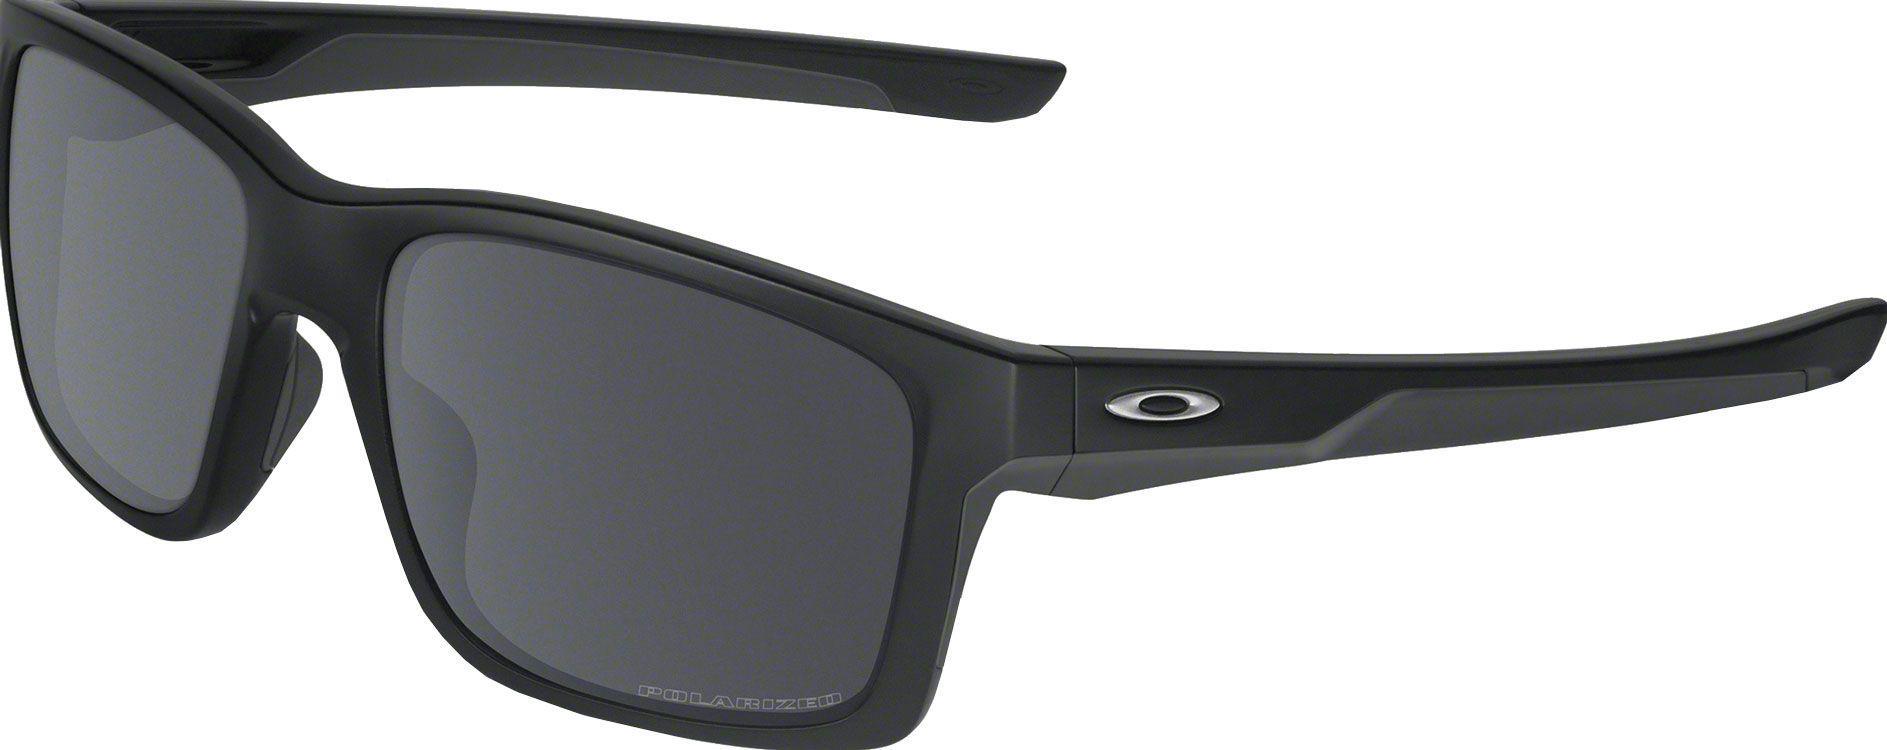 87b757357f1 Lyst - Oakley Mainlink Polarized Sunglasses in Black for Men